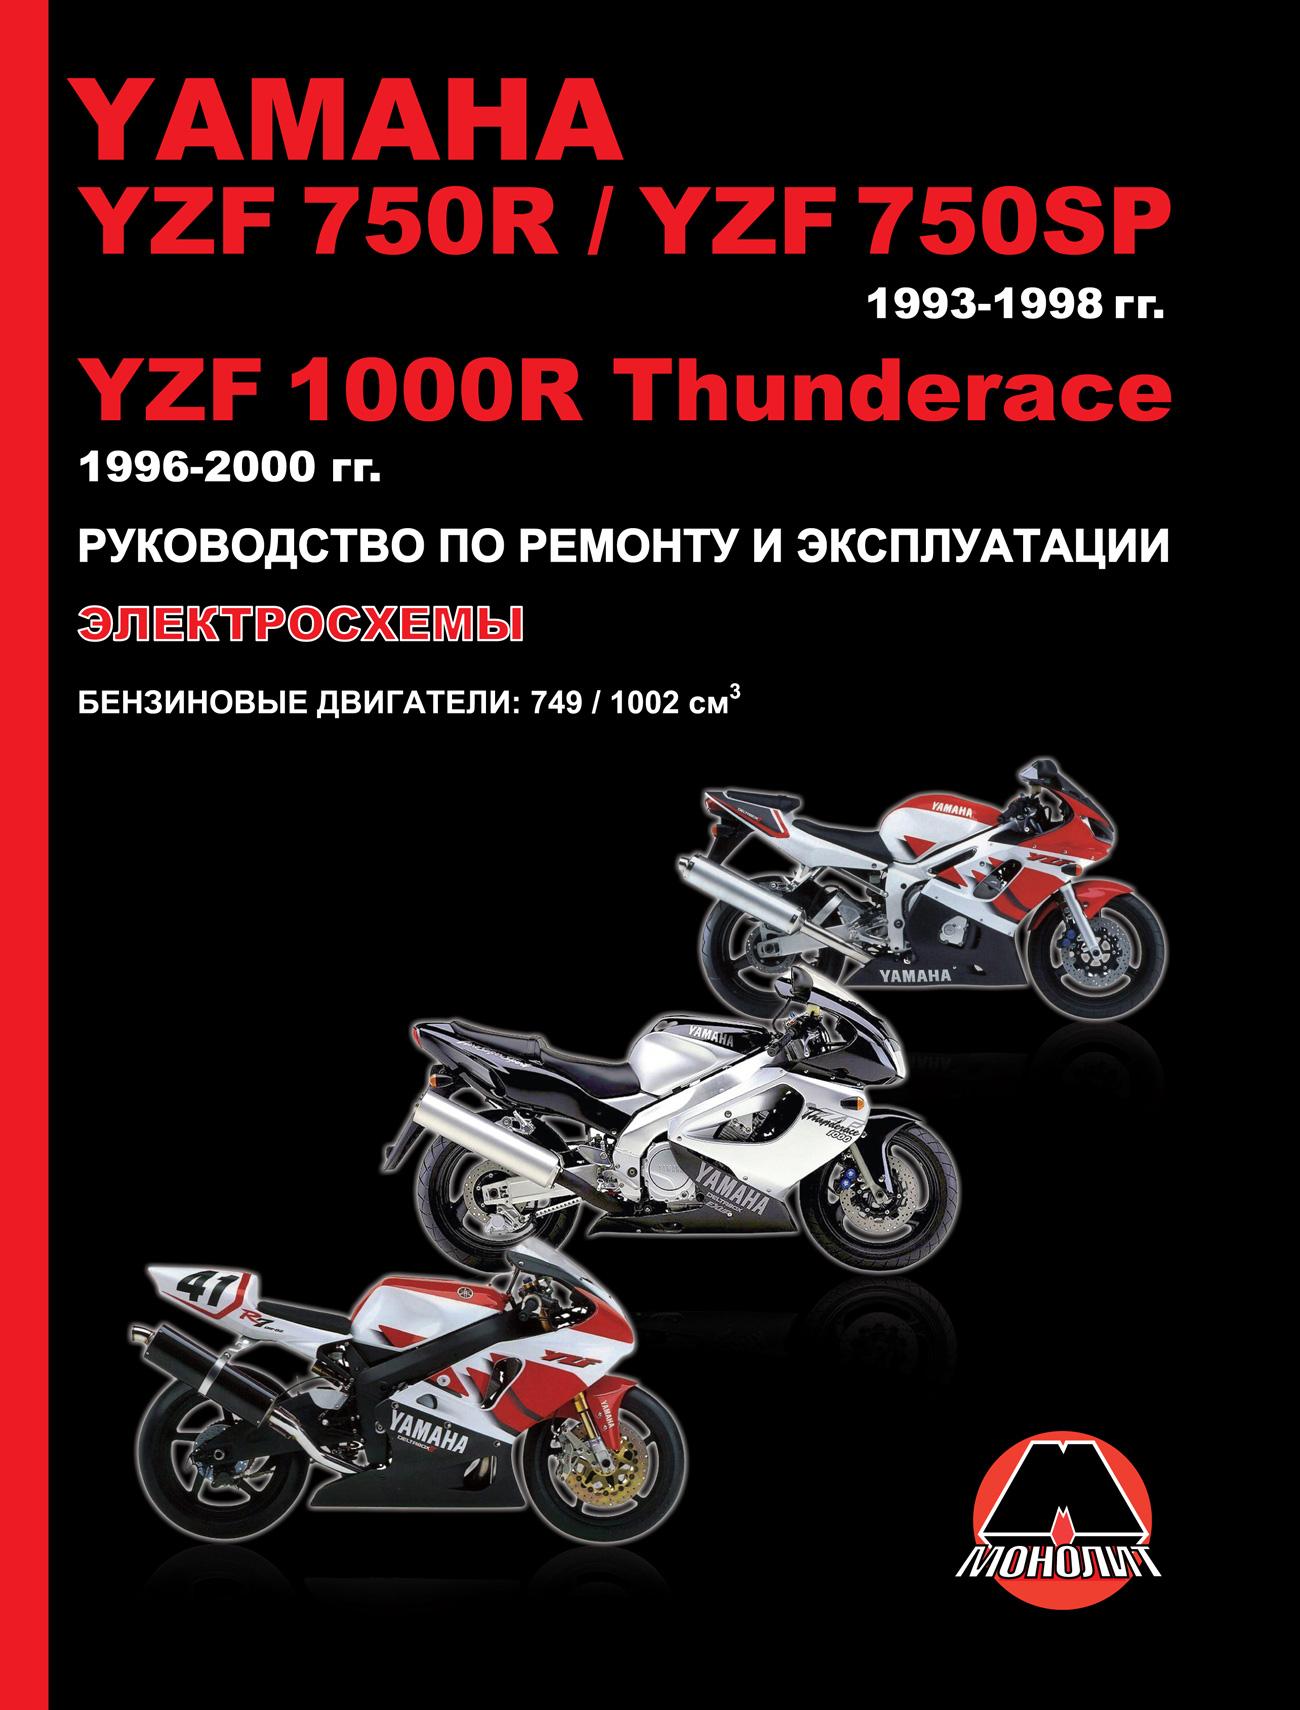 Yamaha fz 750 книга